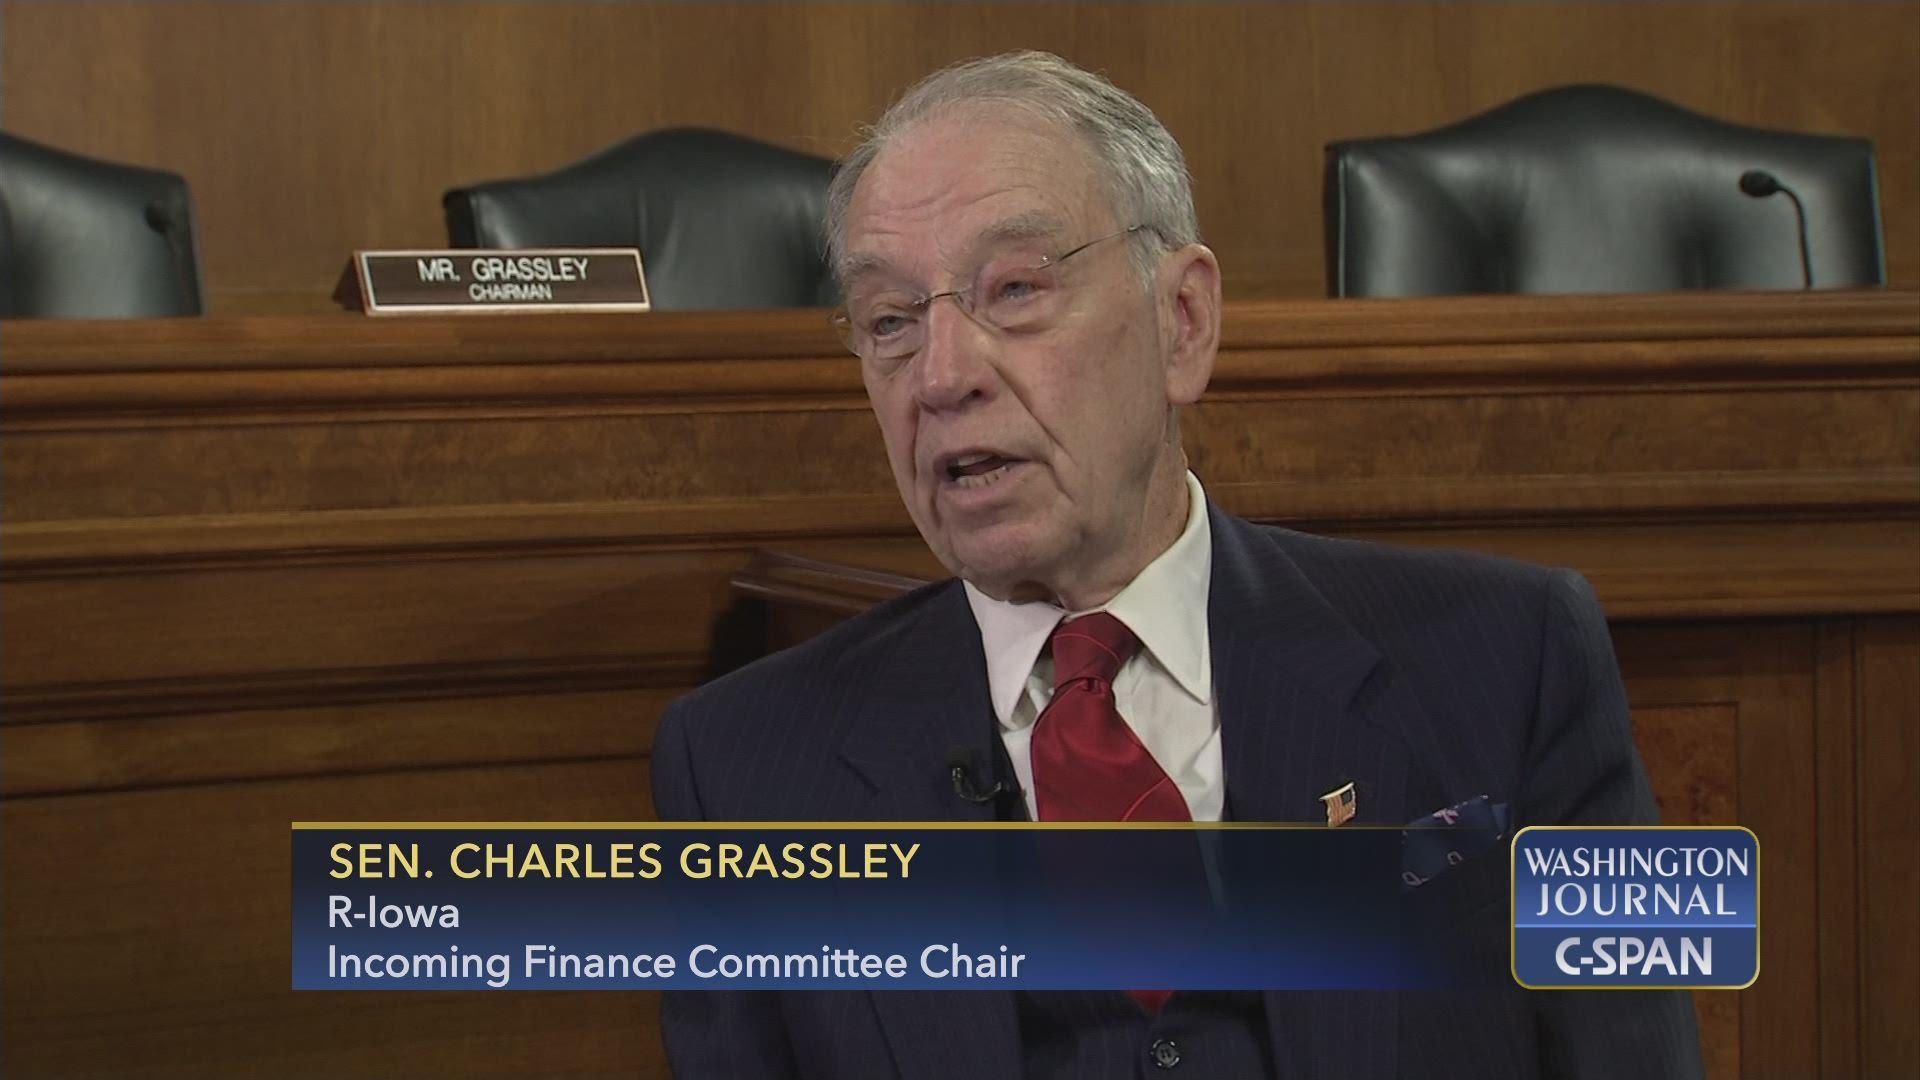 b97dac949 Sen. Grassley (R-IA) on Legislative Priorities for the 116th Congress |  C-SPAN.org